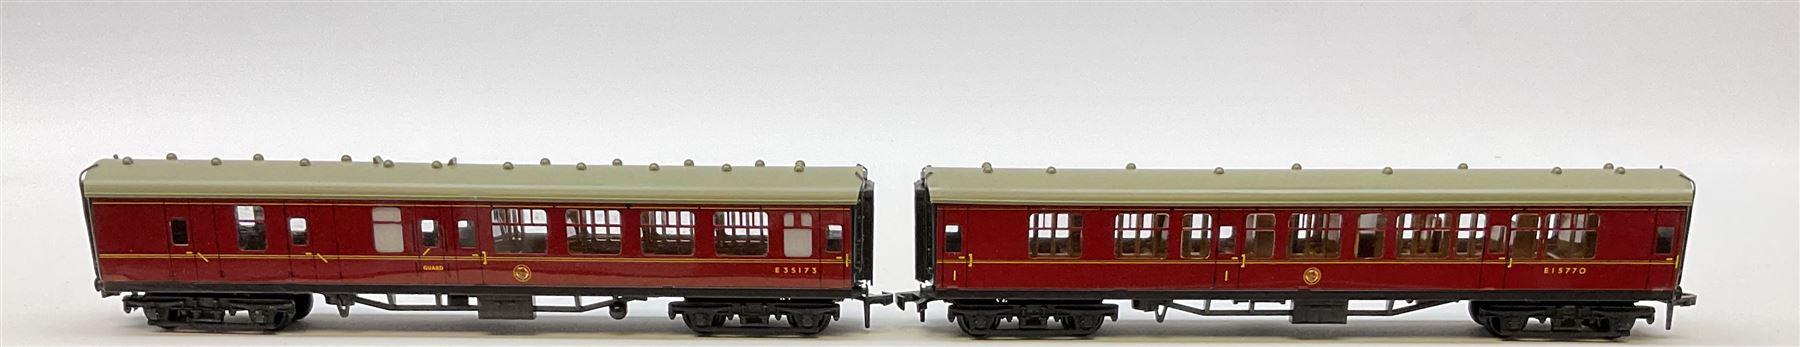 Hornby Dublo - six coaches comprising 4050 Corridor Coach 1st/2nd W.R.; 4051 Corridor Coach Brake/2n - Image 3 of 5